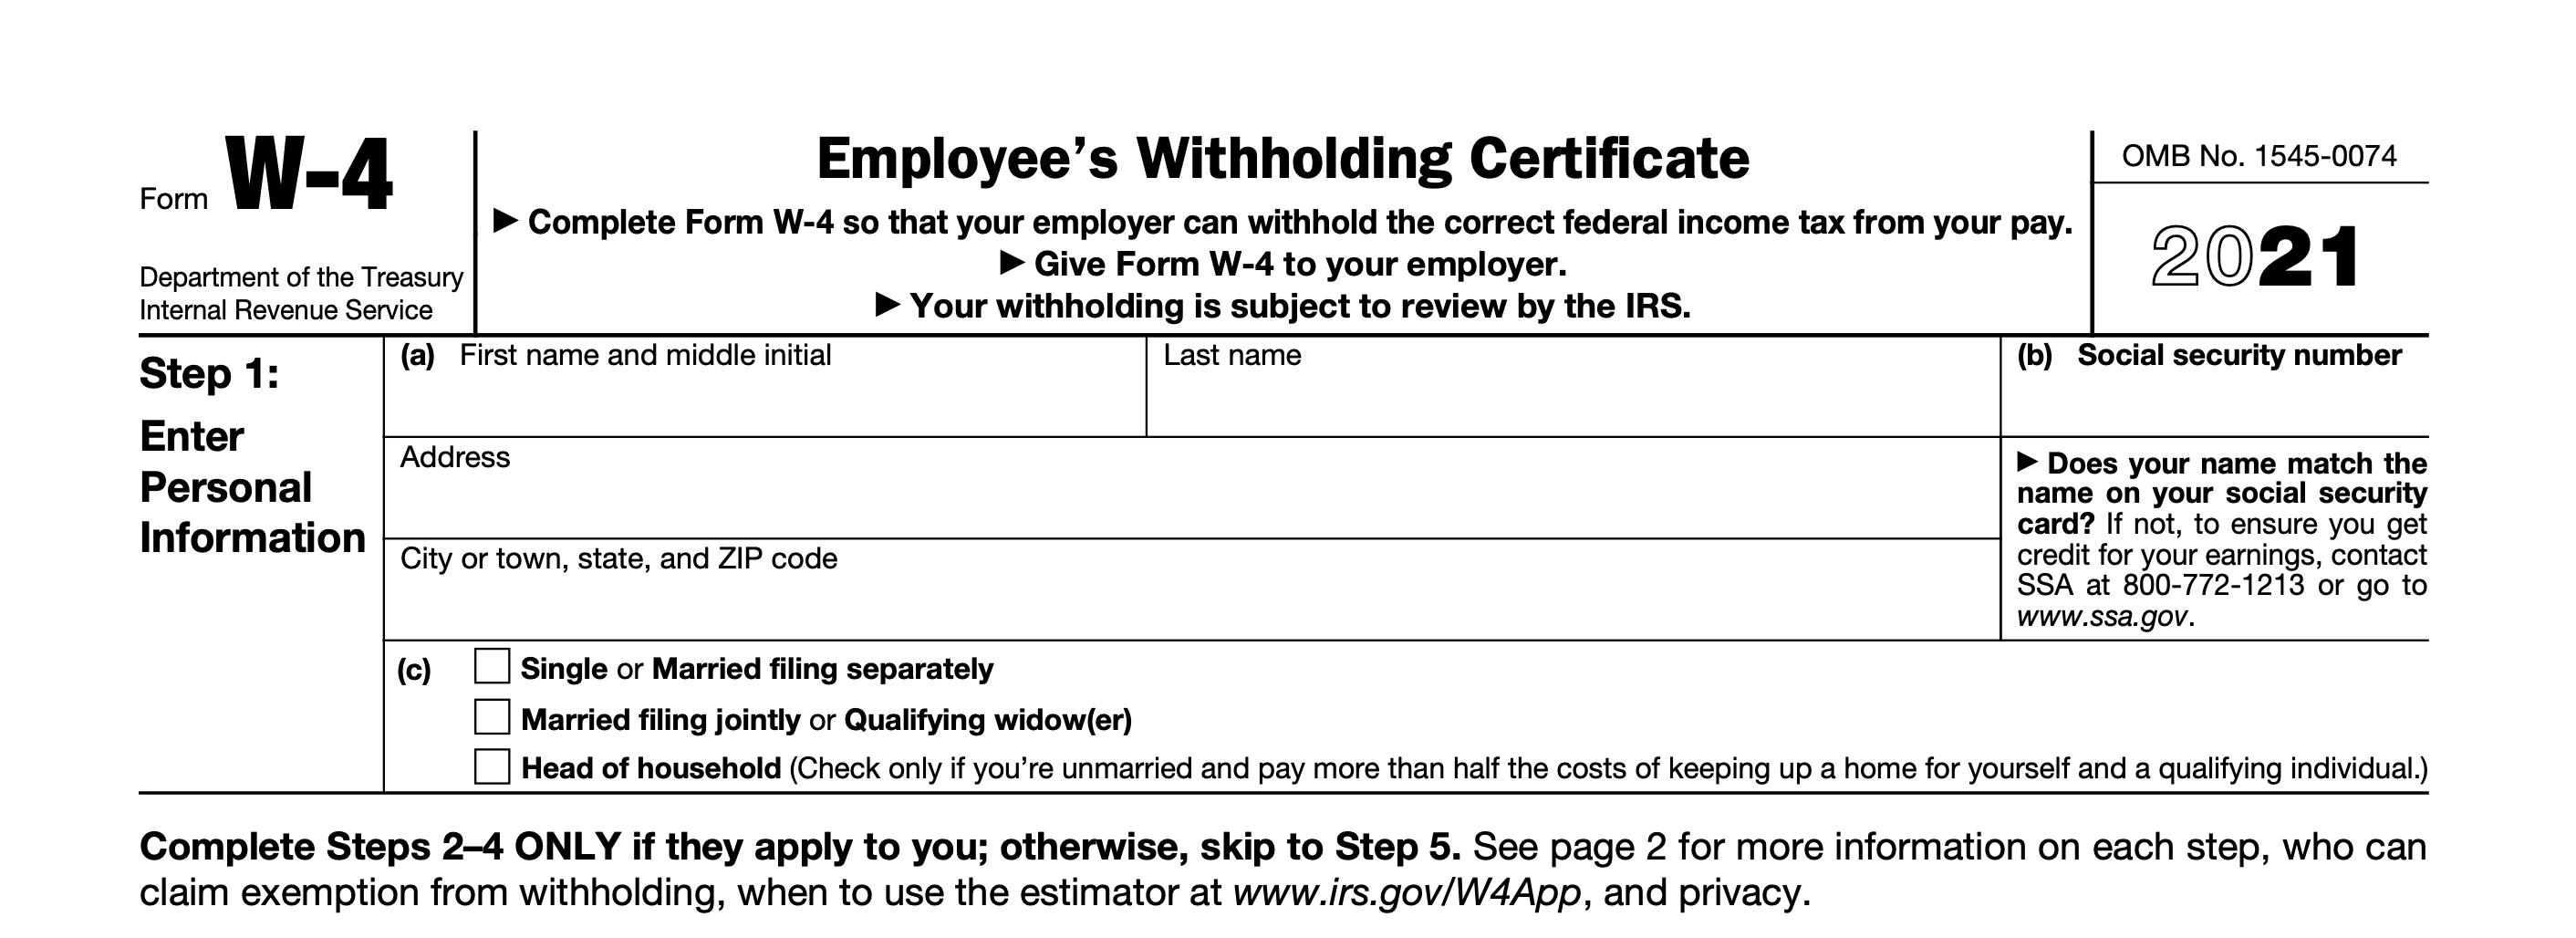 Oregon W 4 Form 2021 Instructions